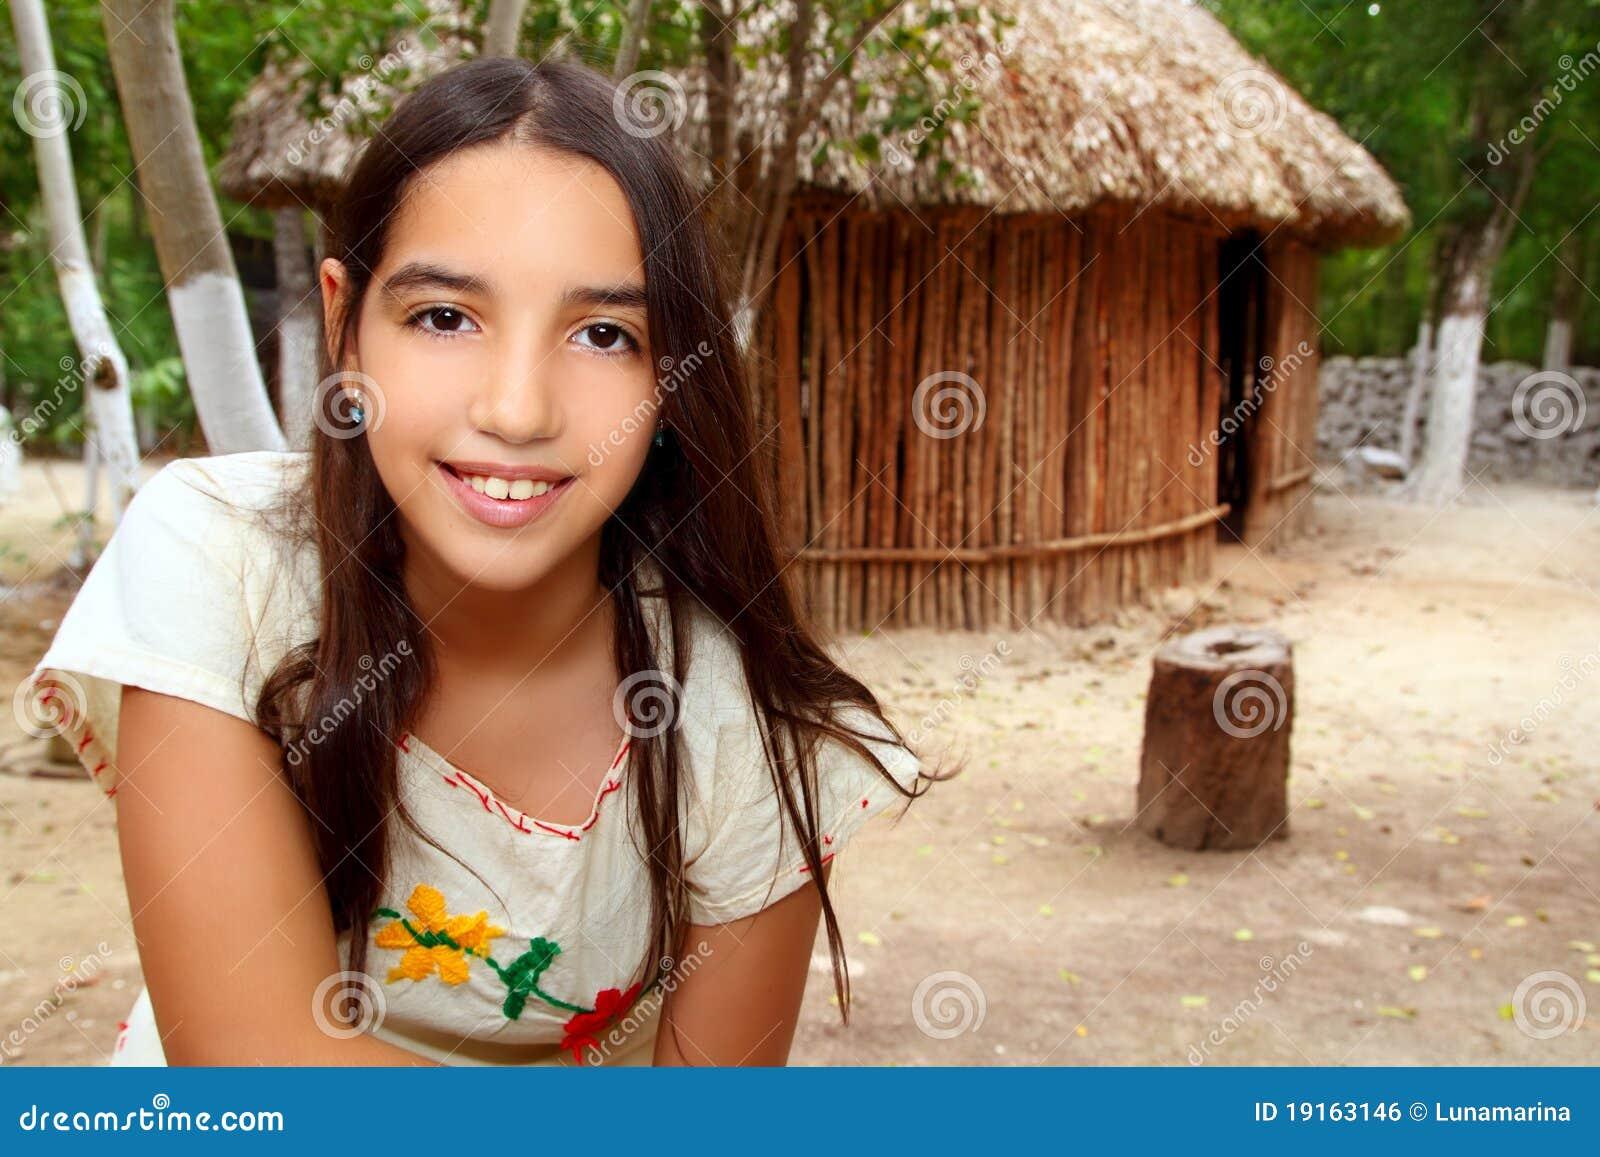 55930634a463a Menina Latin Maia Indiana Mexicana Na Selva Foto de Stock - Imagem ...